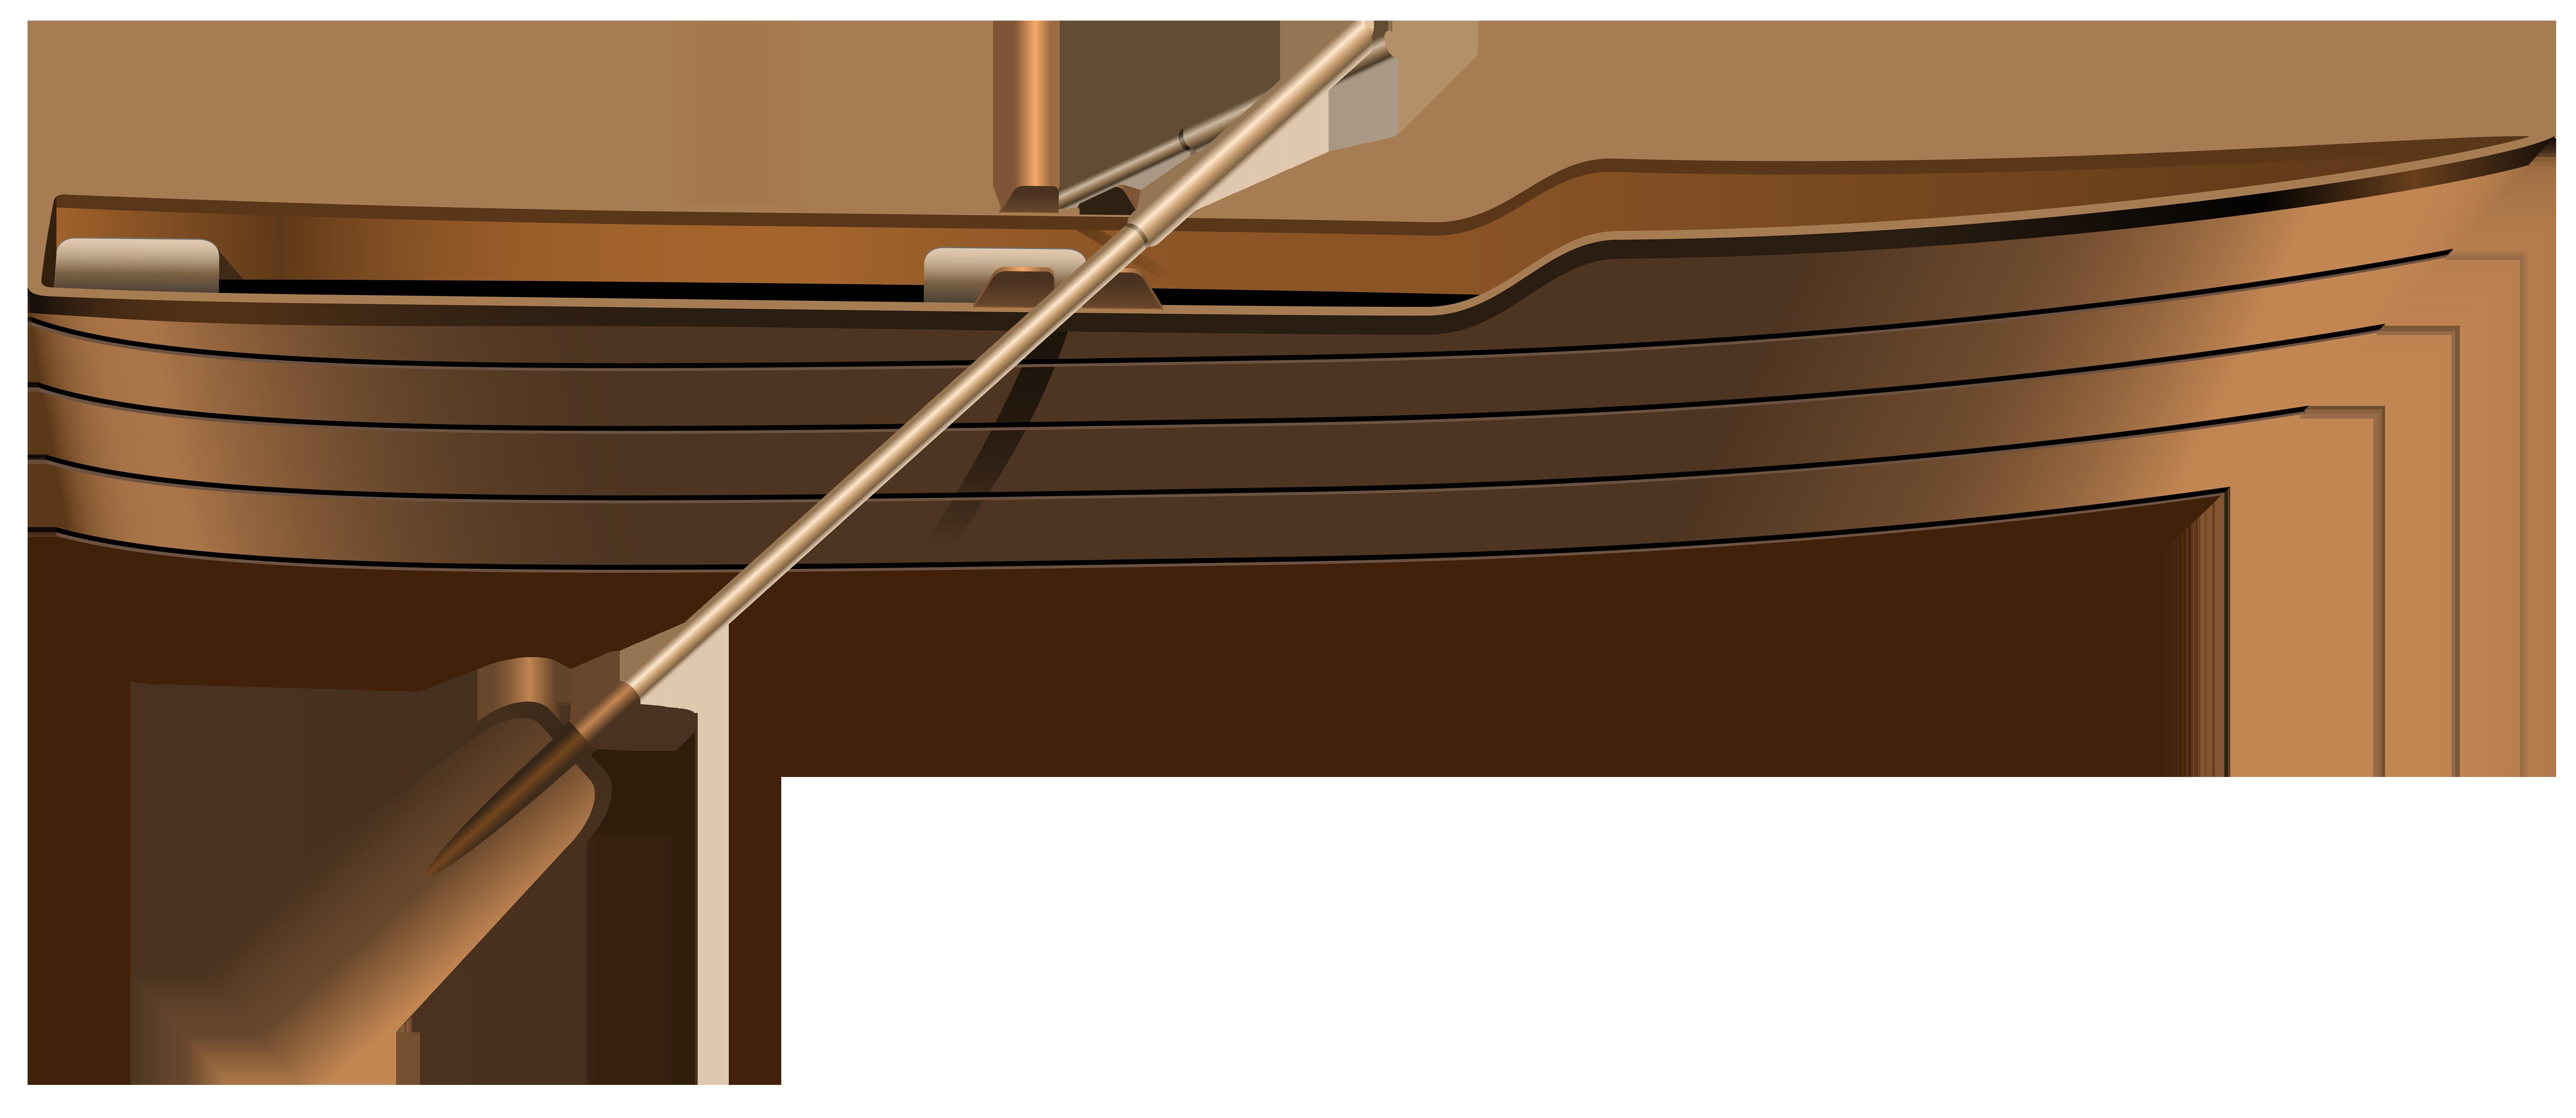 Canoe clipart wooden canoe Wooden Boat PNG Art WEB